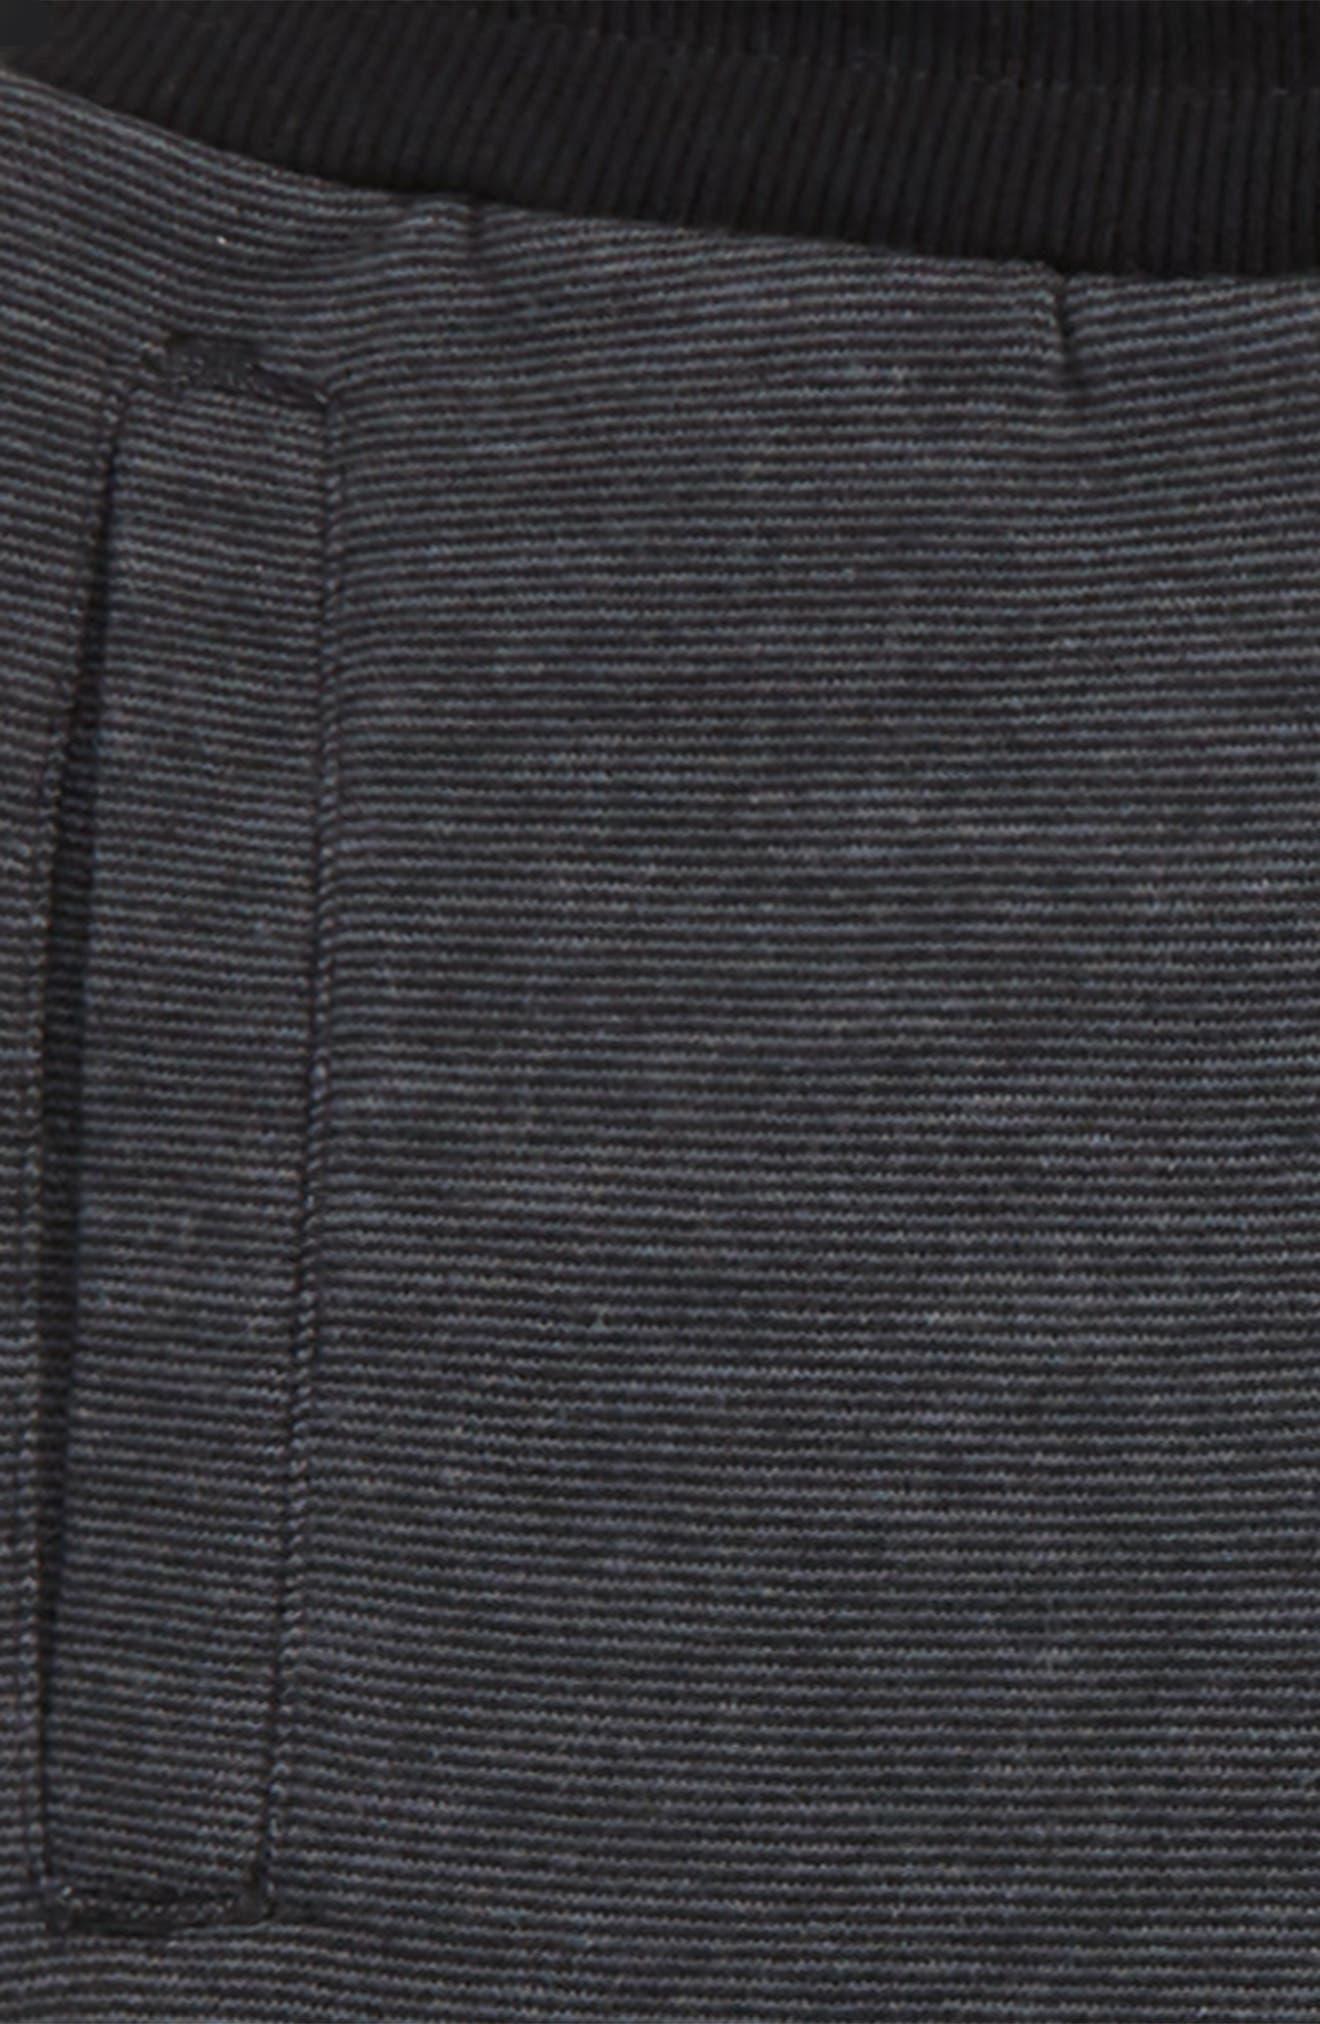 Balance Shorts,                             Alternate thumbnail 2, color,                             002